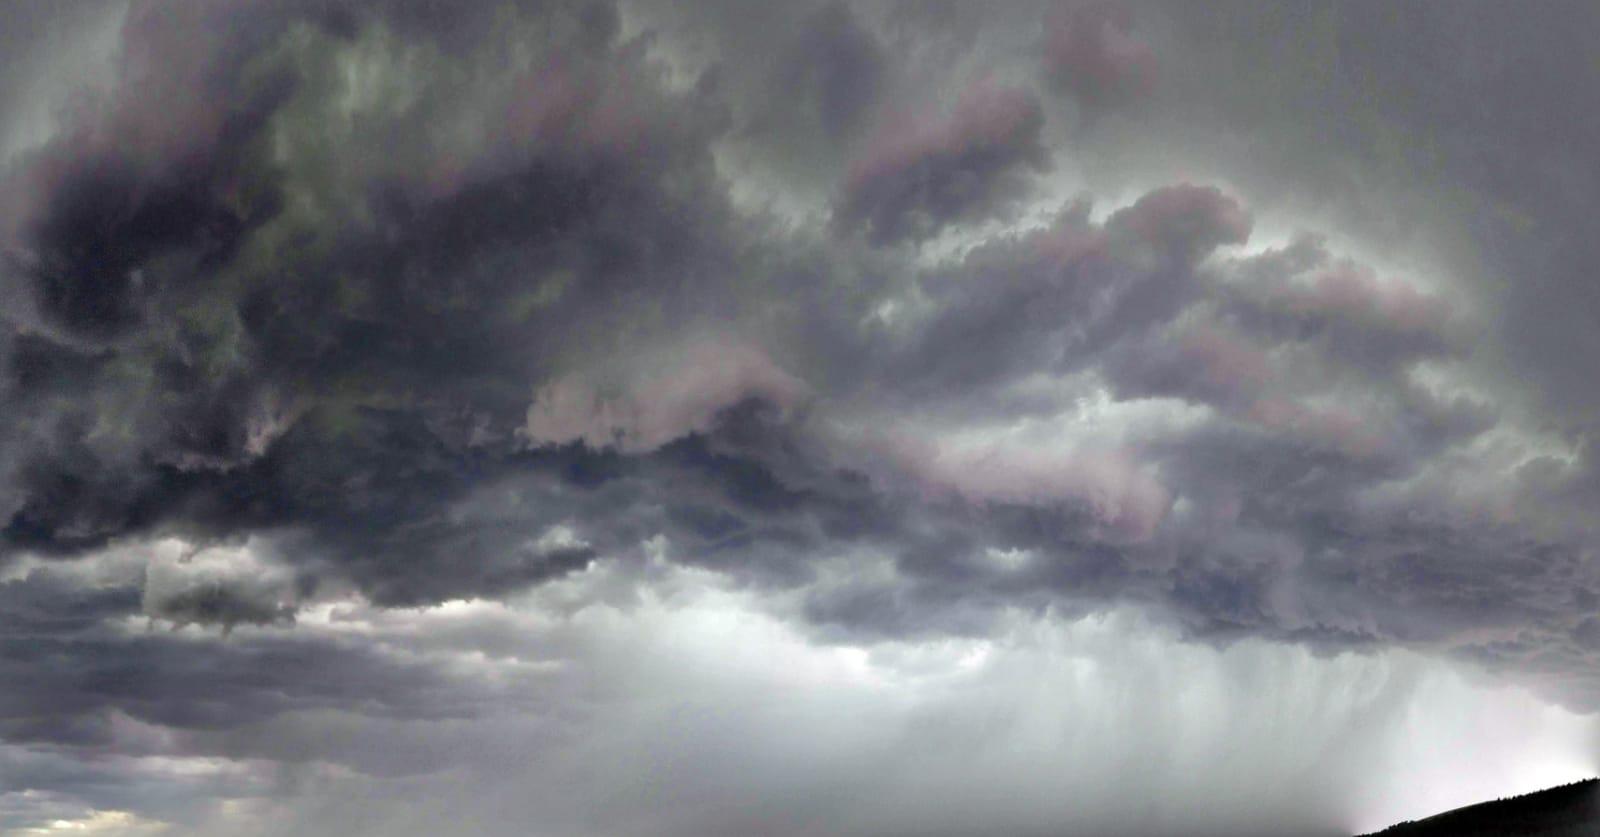 [eiberri.eus] Miércoles nuboso con alguna llovizna en Debabarrena